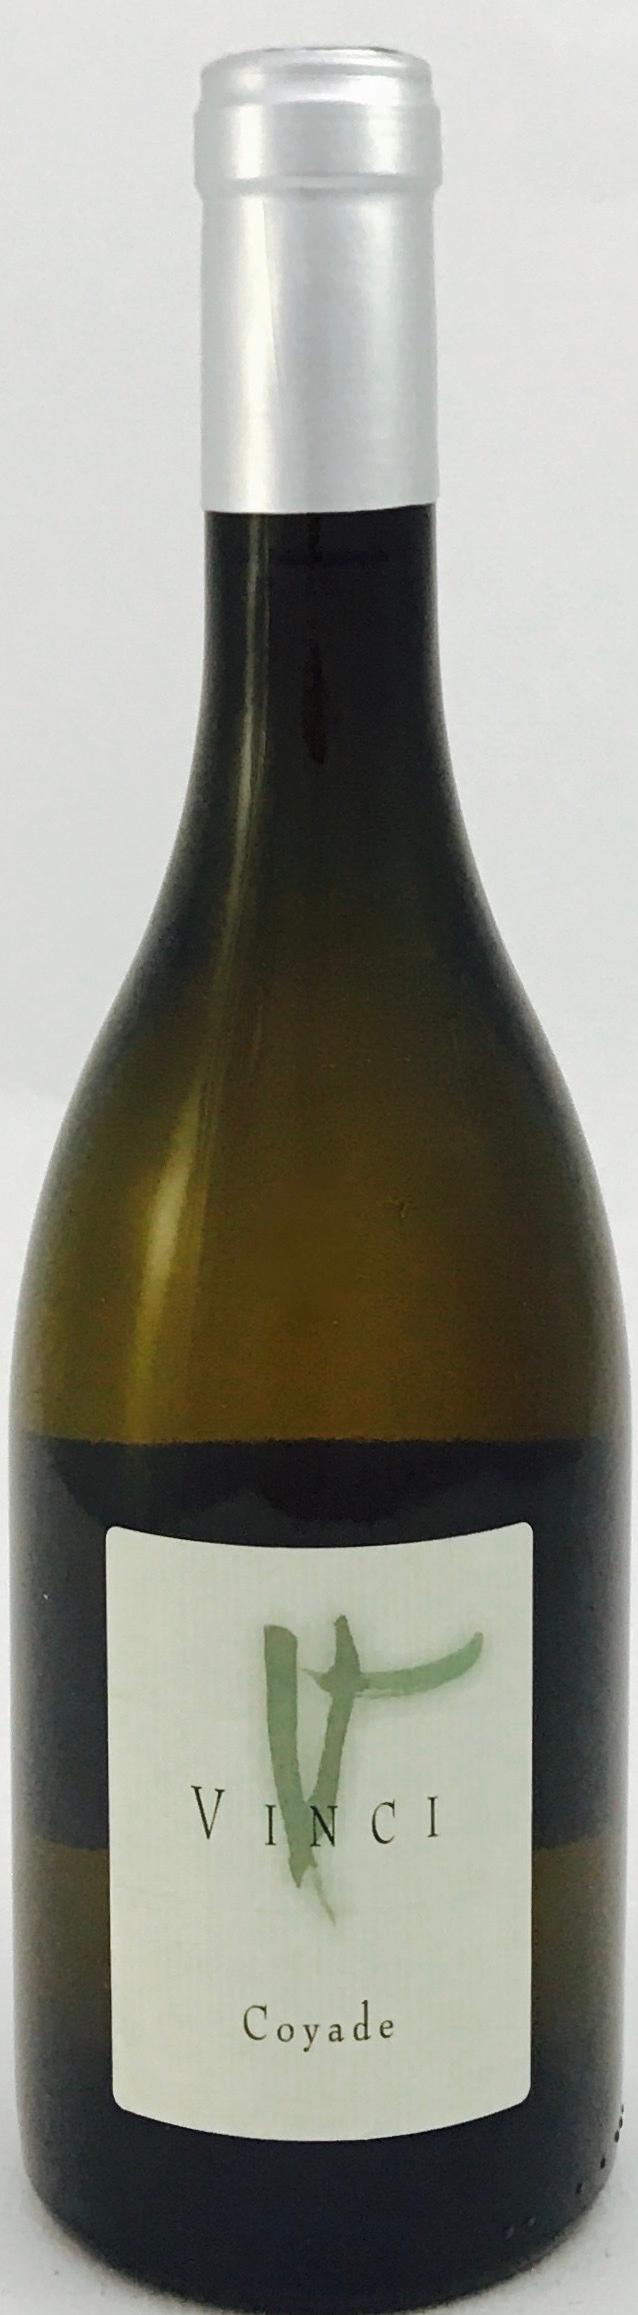 Vino bianco Coyade Cotes Catalanes